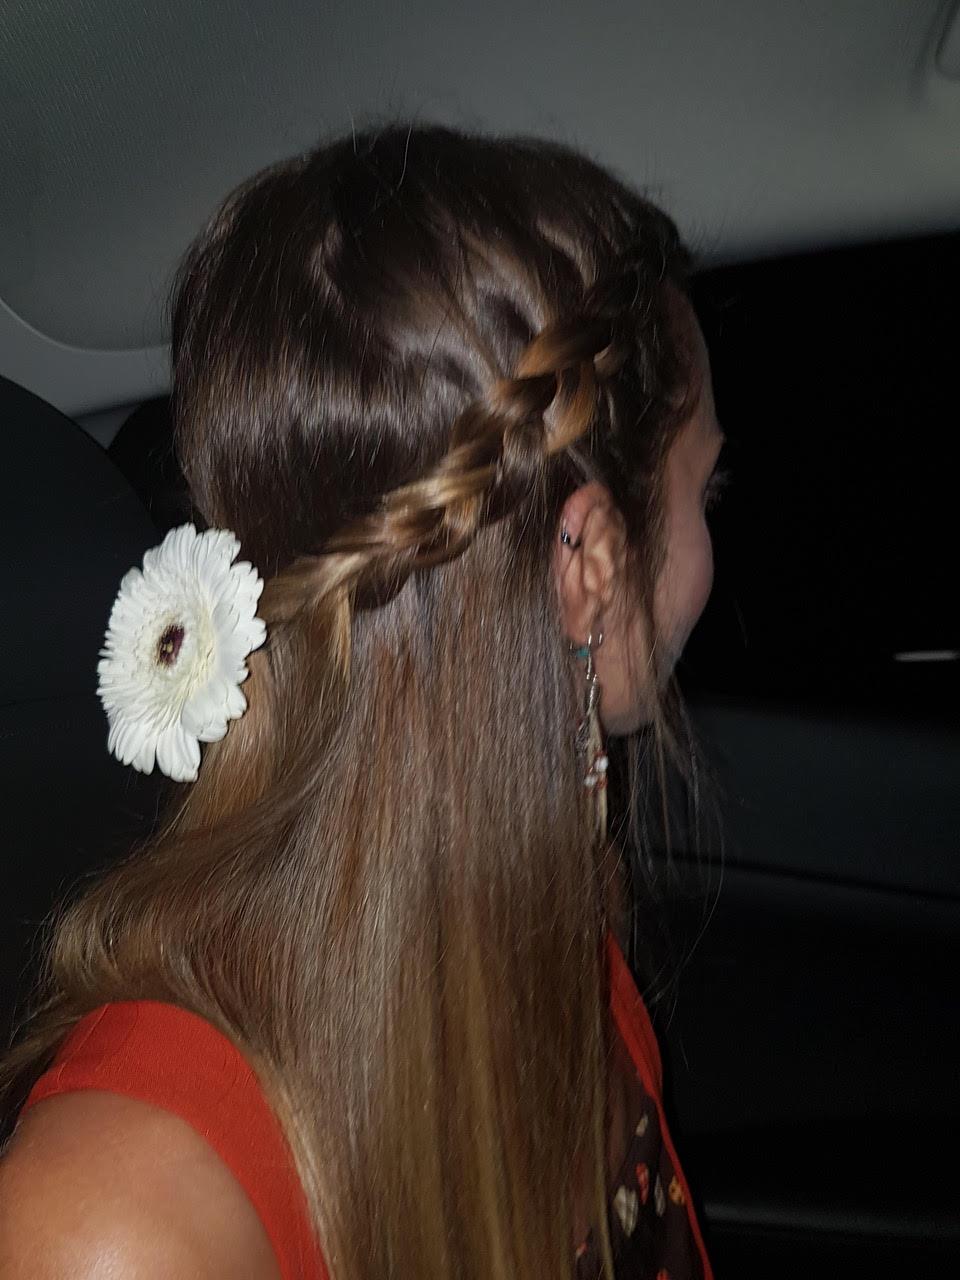 flower in her hair - photo #31